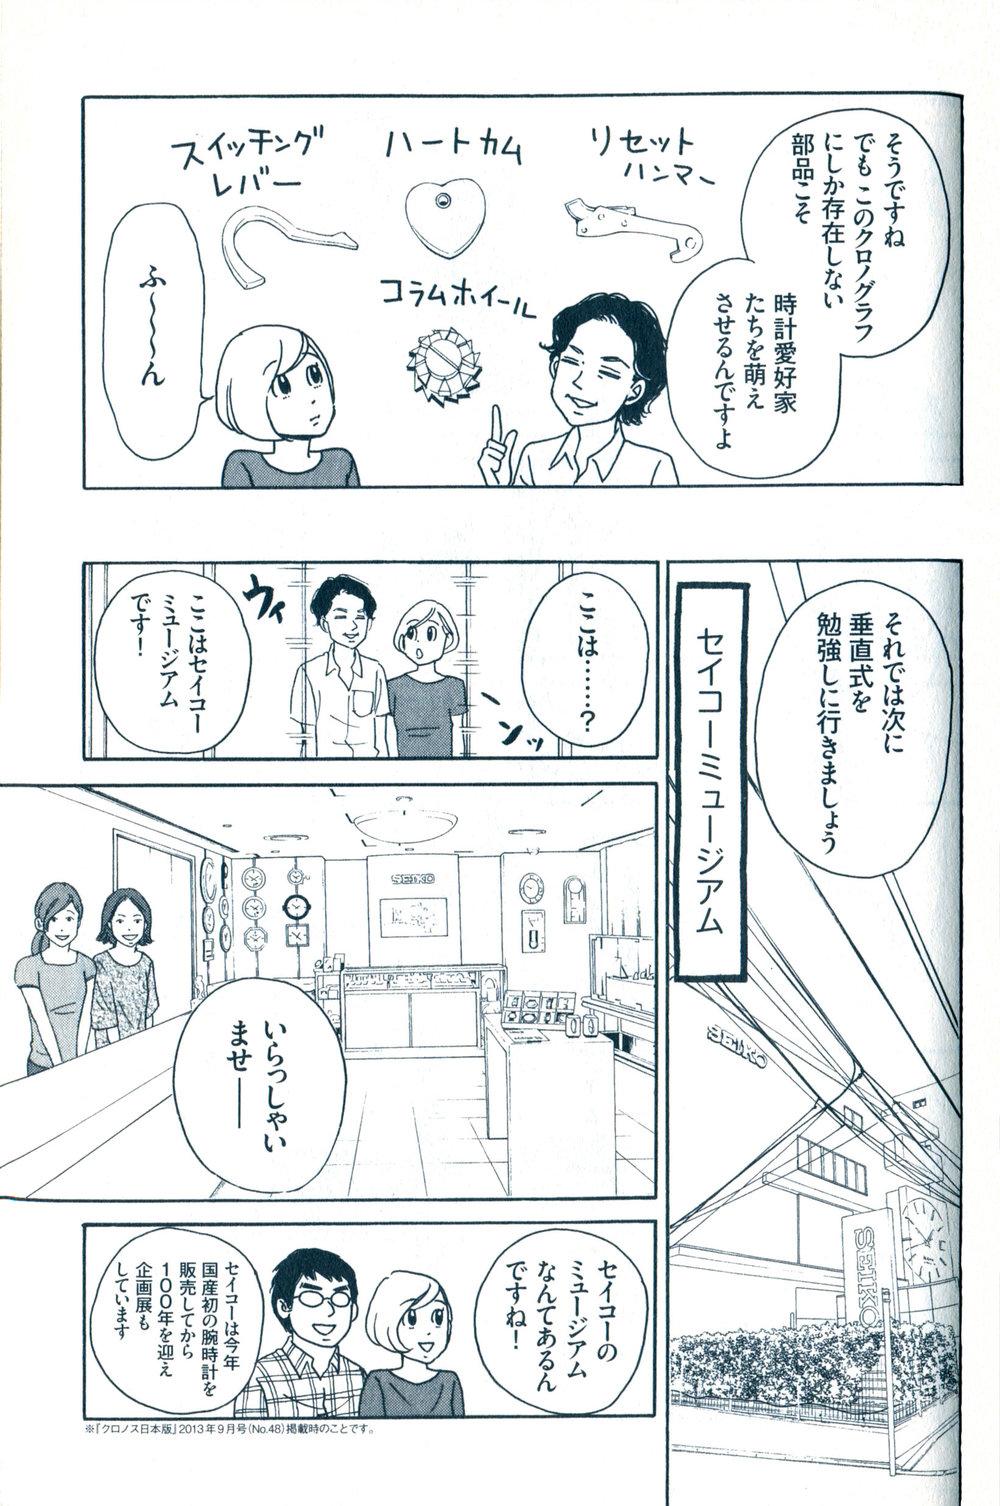 Excerpt - Japanese